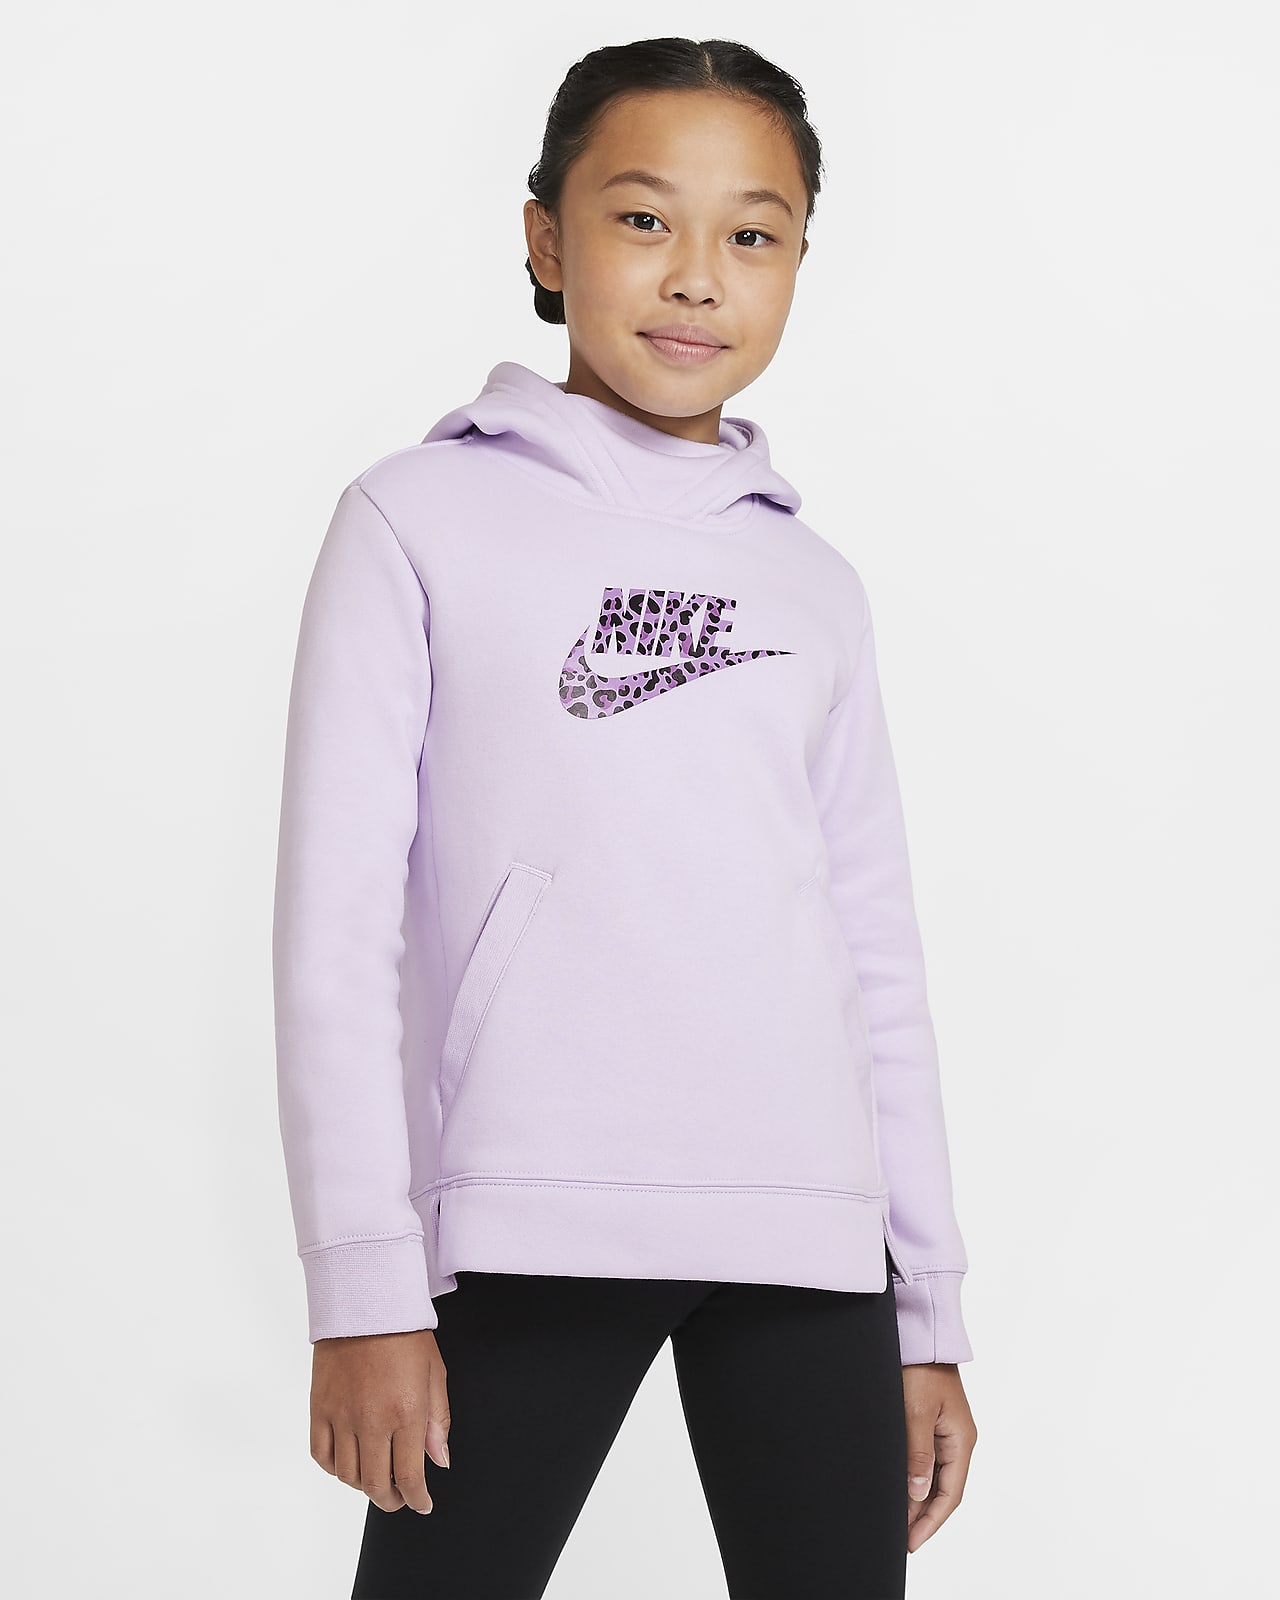 Худи для девочек школьного возраста Nike Sportswear